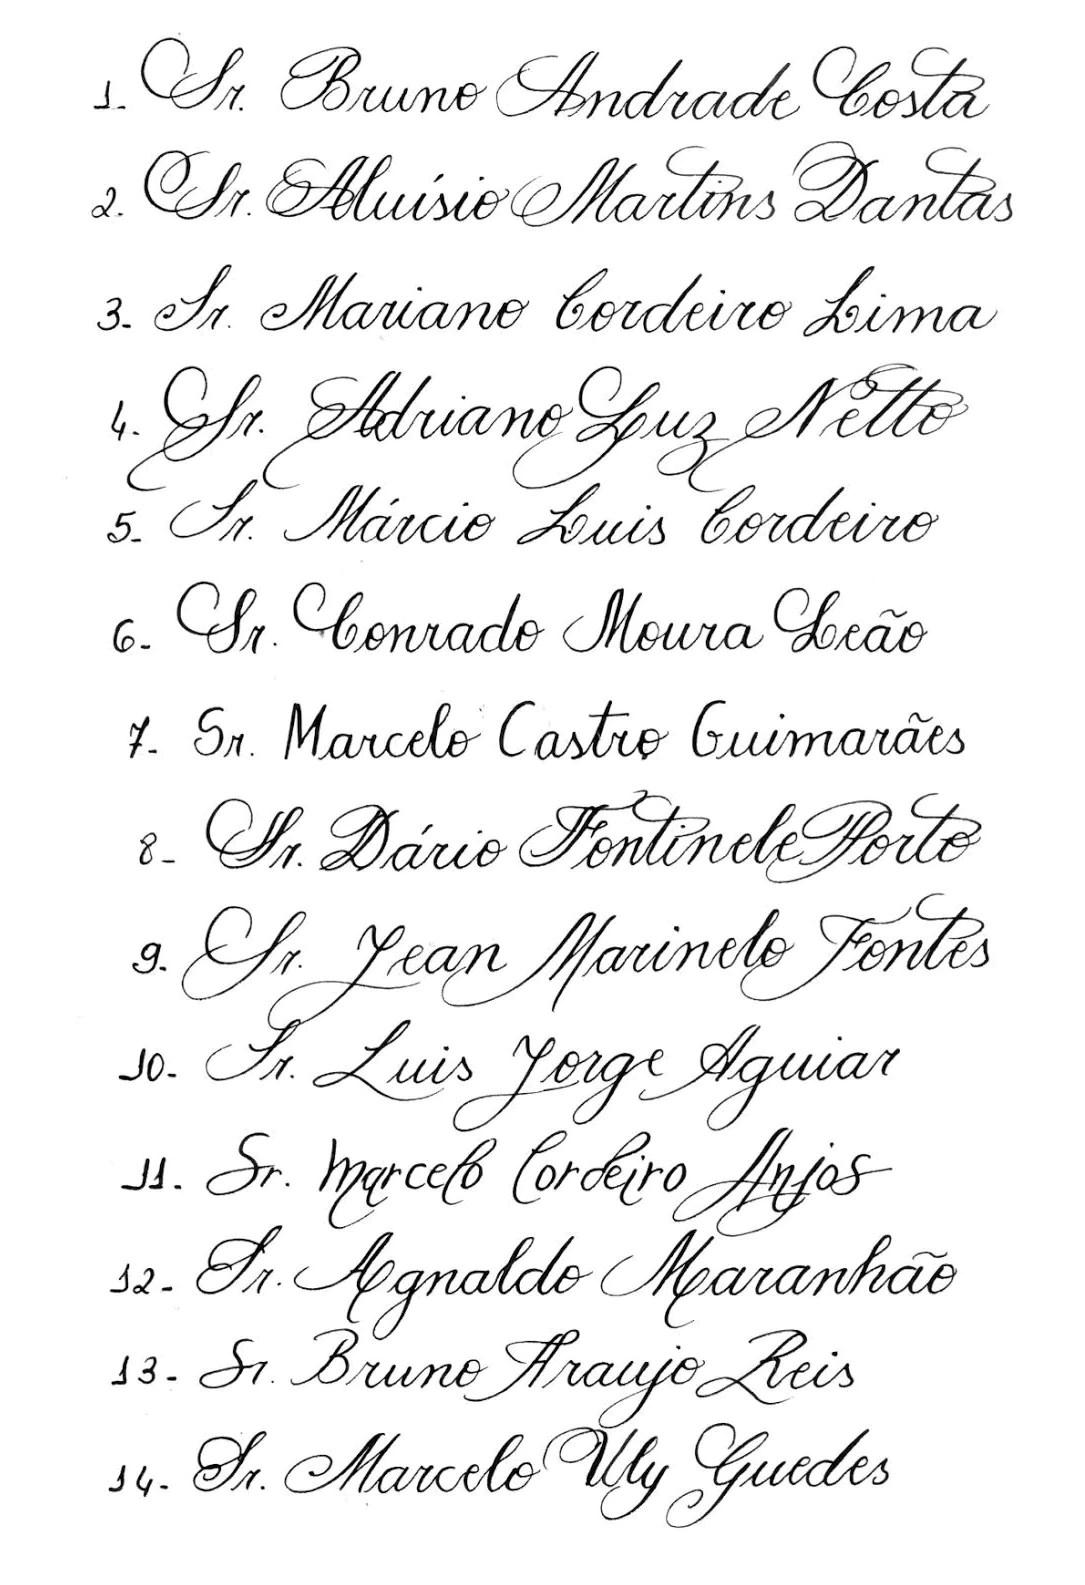 Alfabeto Caligrafia Para Convites Caligrafia Manual